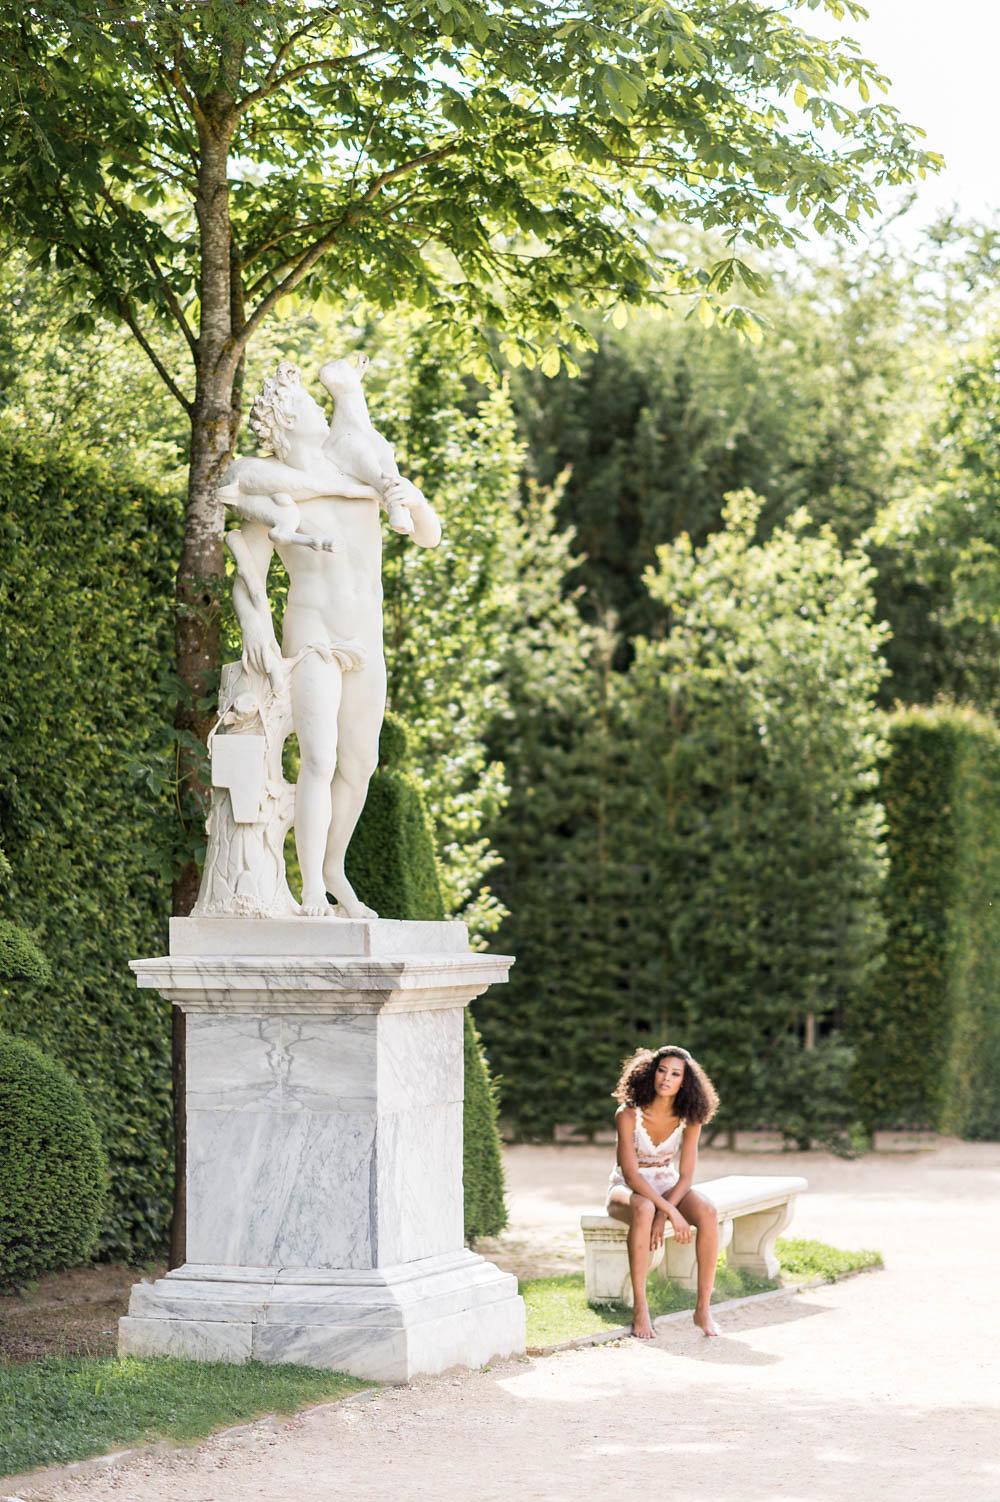 This photo was featured in Vogue Italia's online Photo Archive. YEAAAAAAAH WHITNEY!!! #dreamcometrue